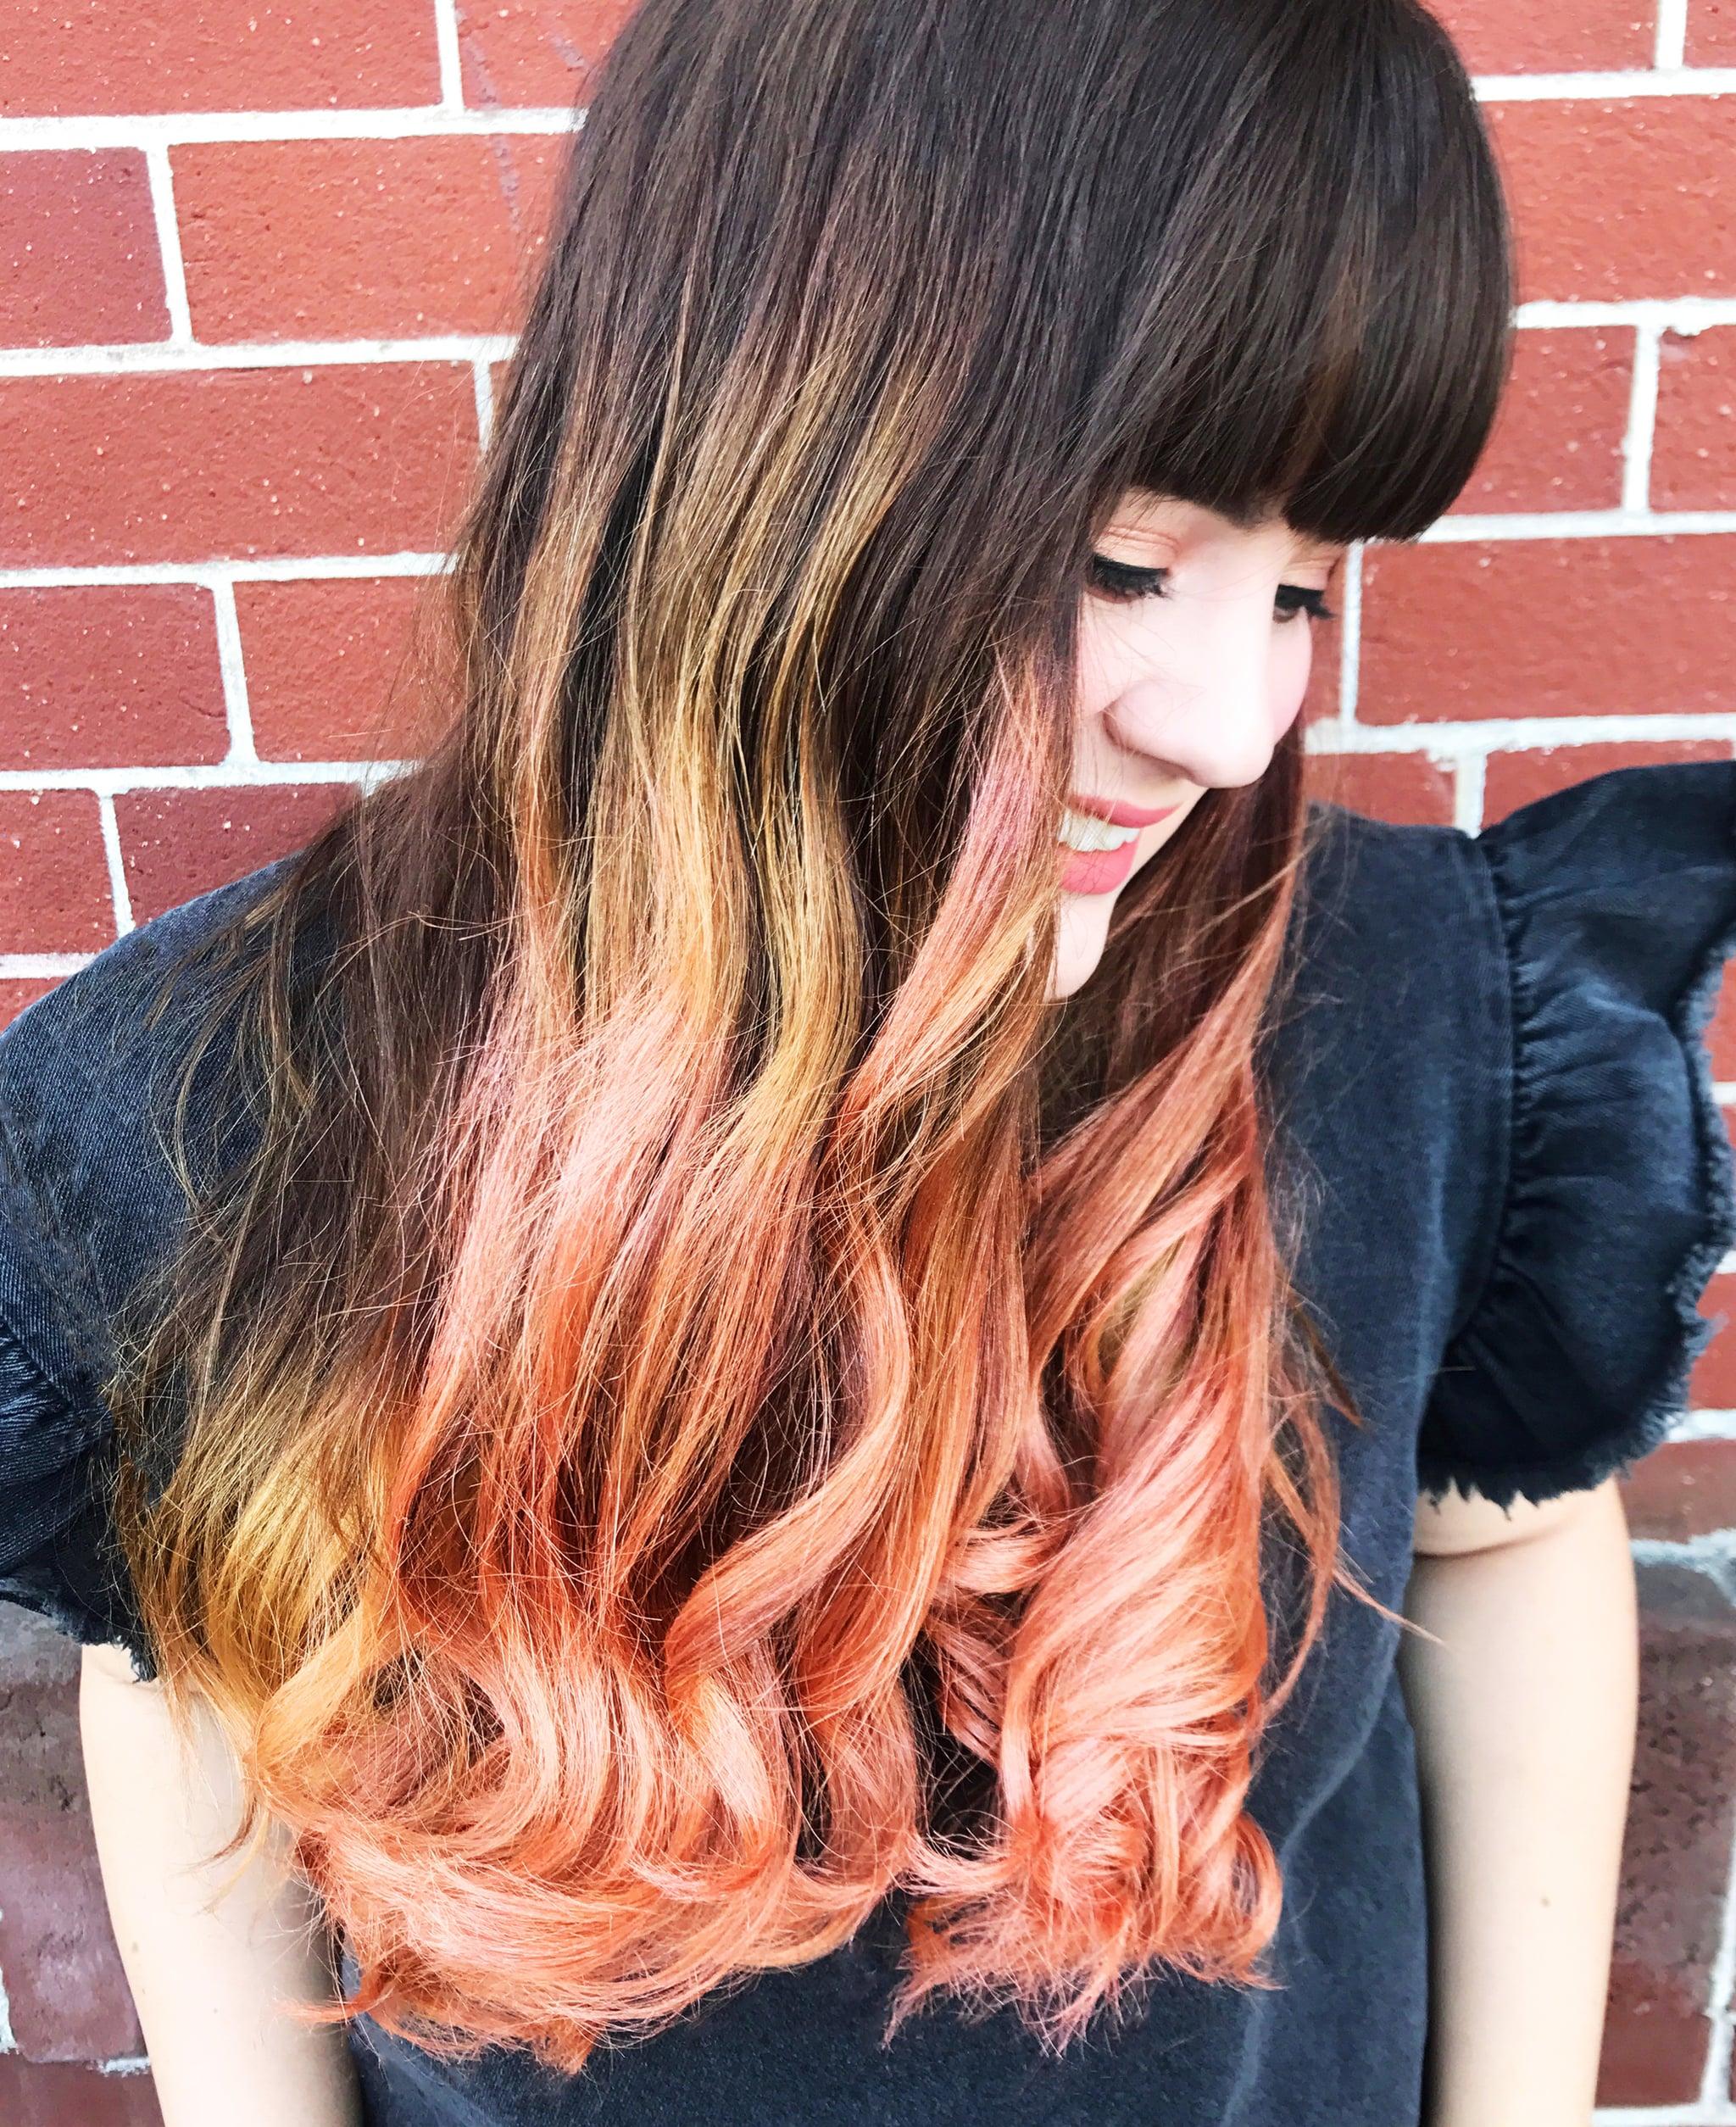 Clairol Rose Gold Hair Makeup Review Popsugar Beauty